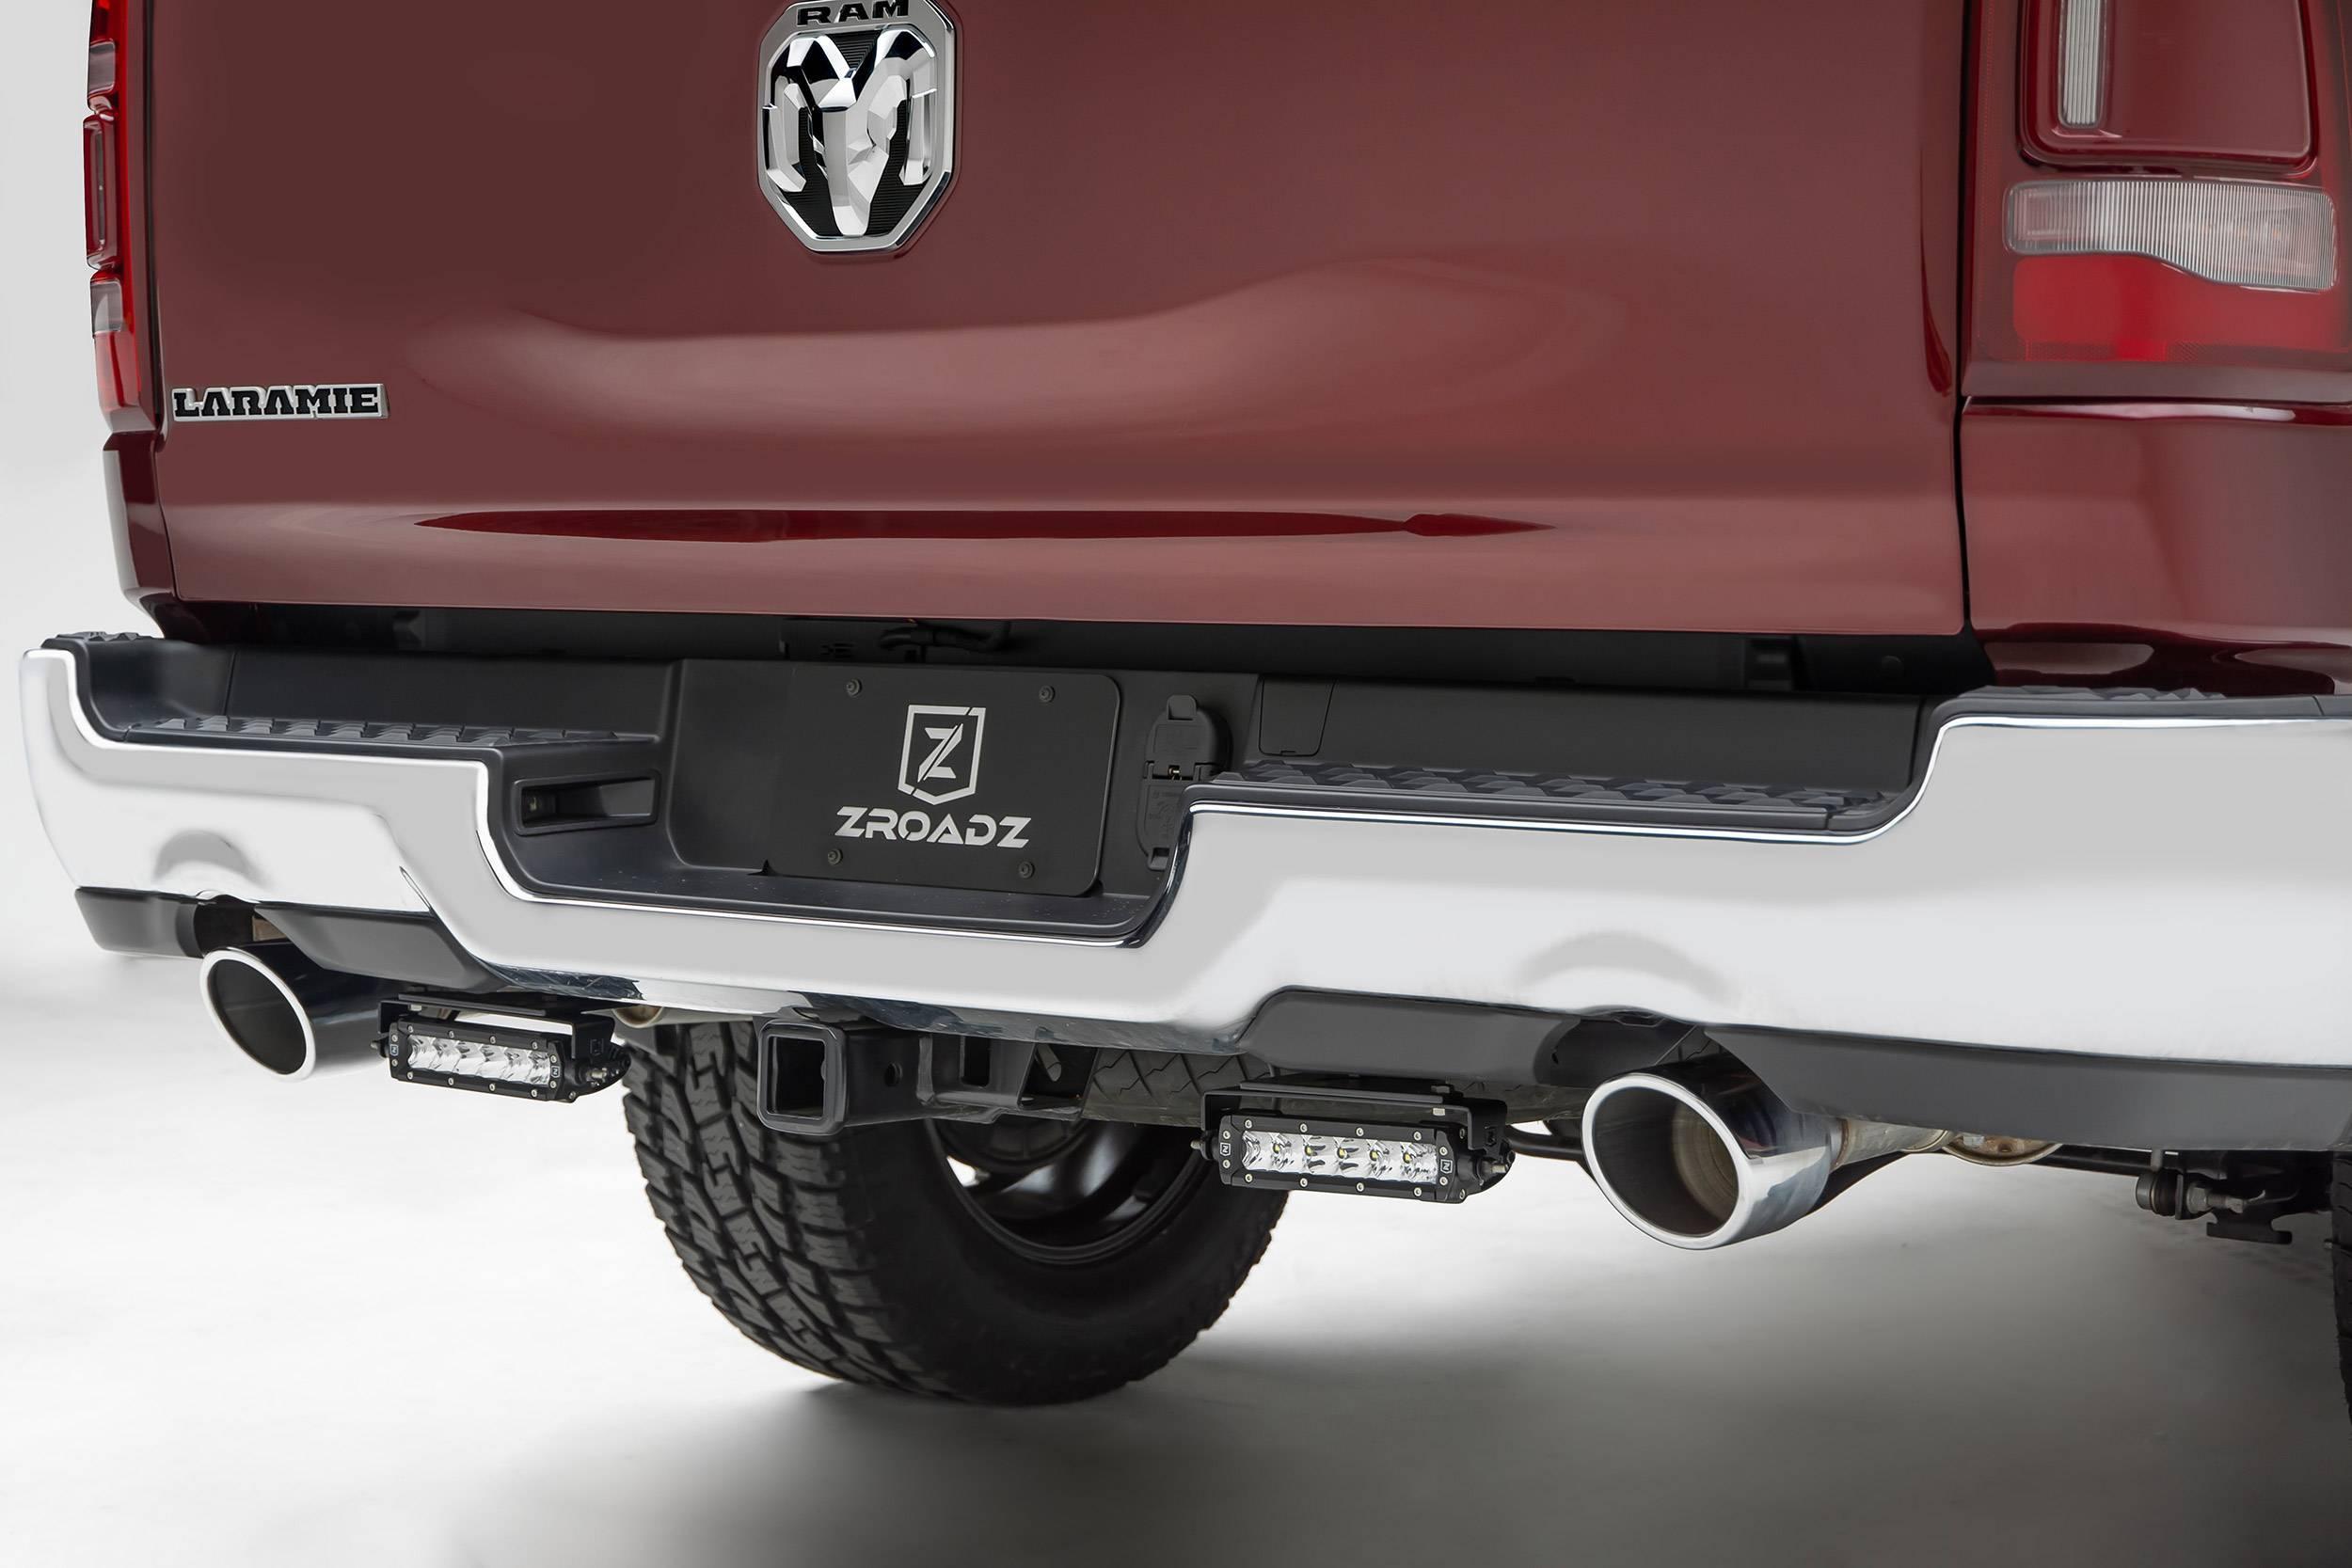 2019 2021 ram 1500 rear bumper led bracket to mount 2 6 inch straight single row light bar pn z384821